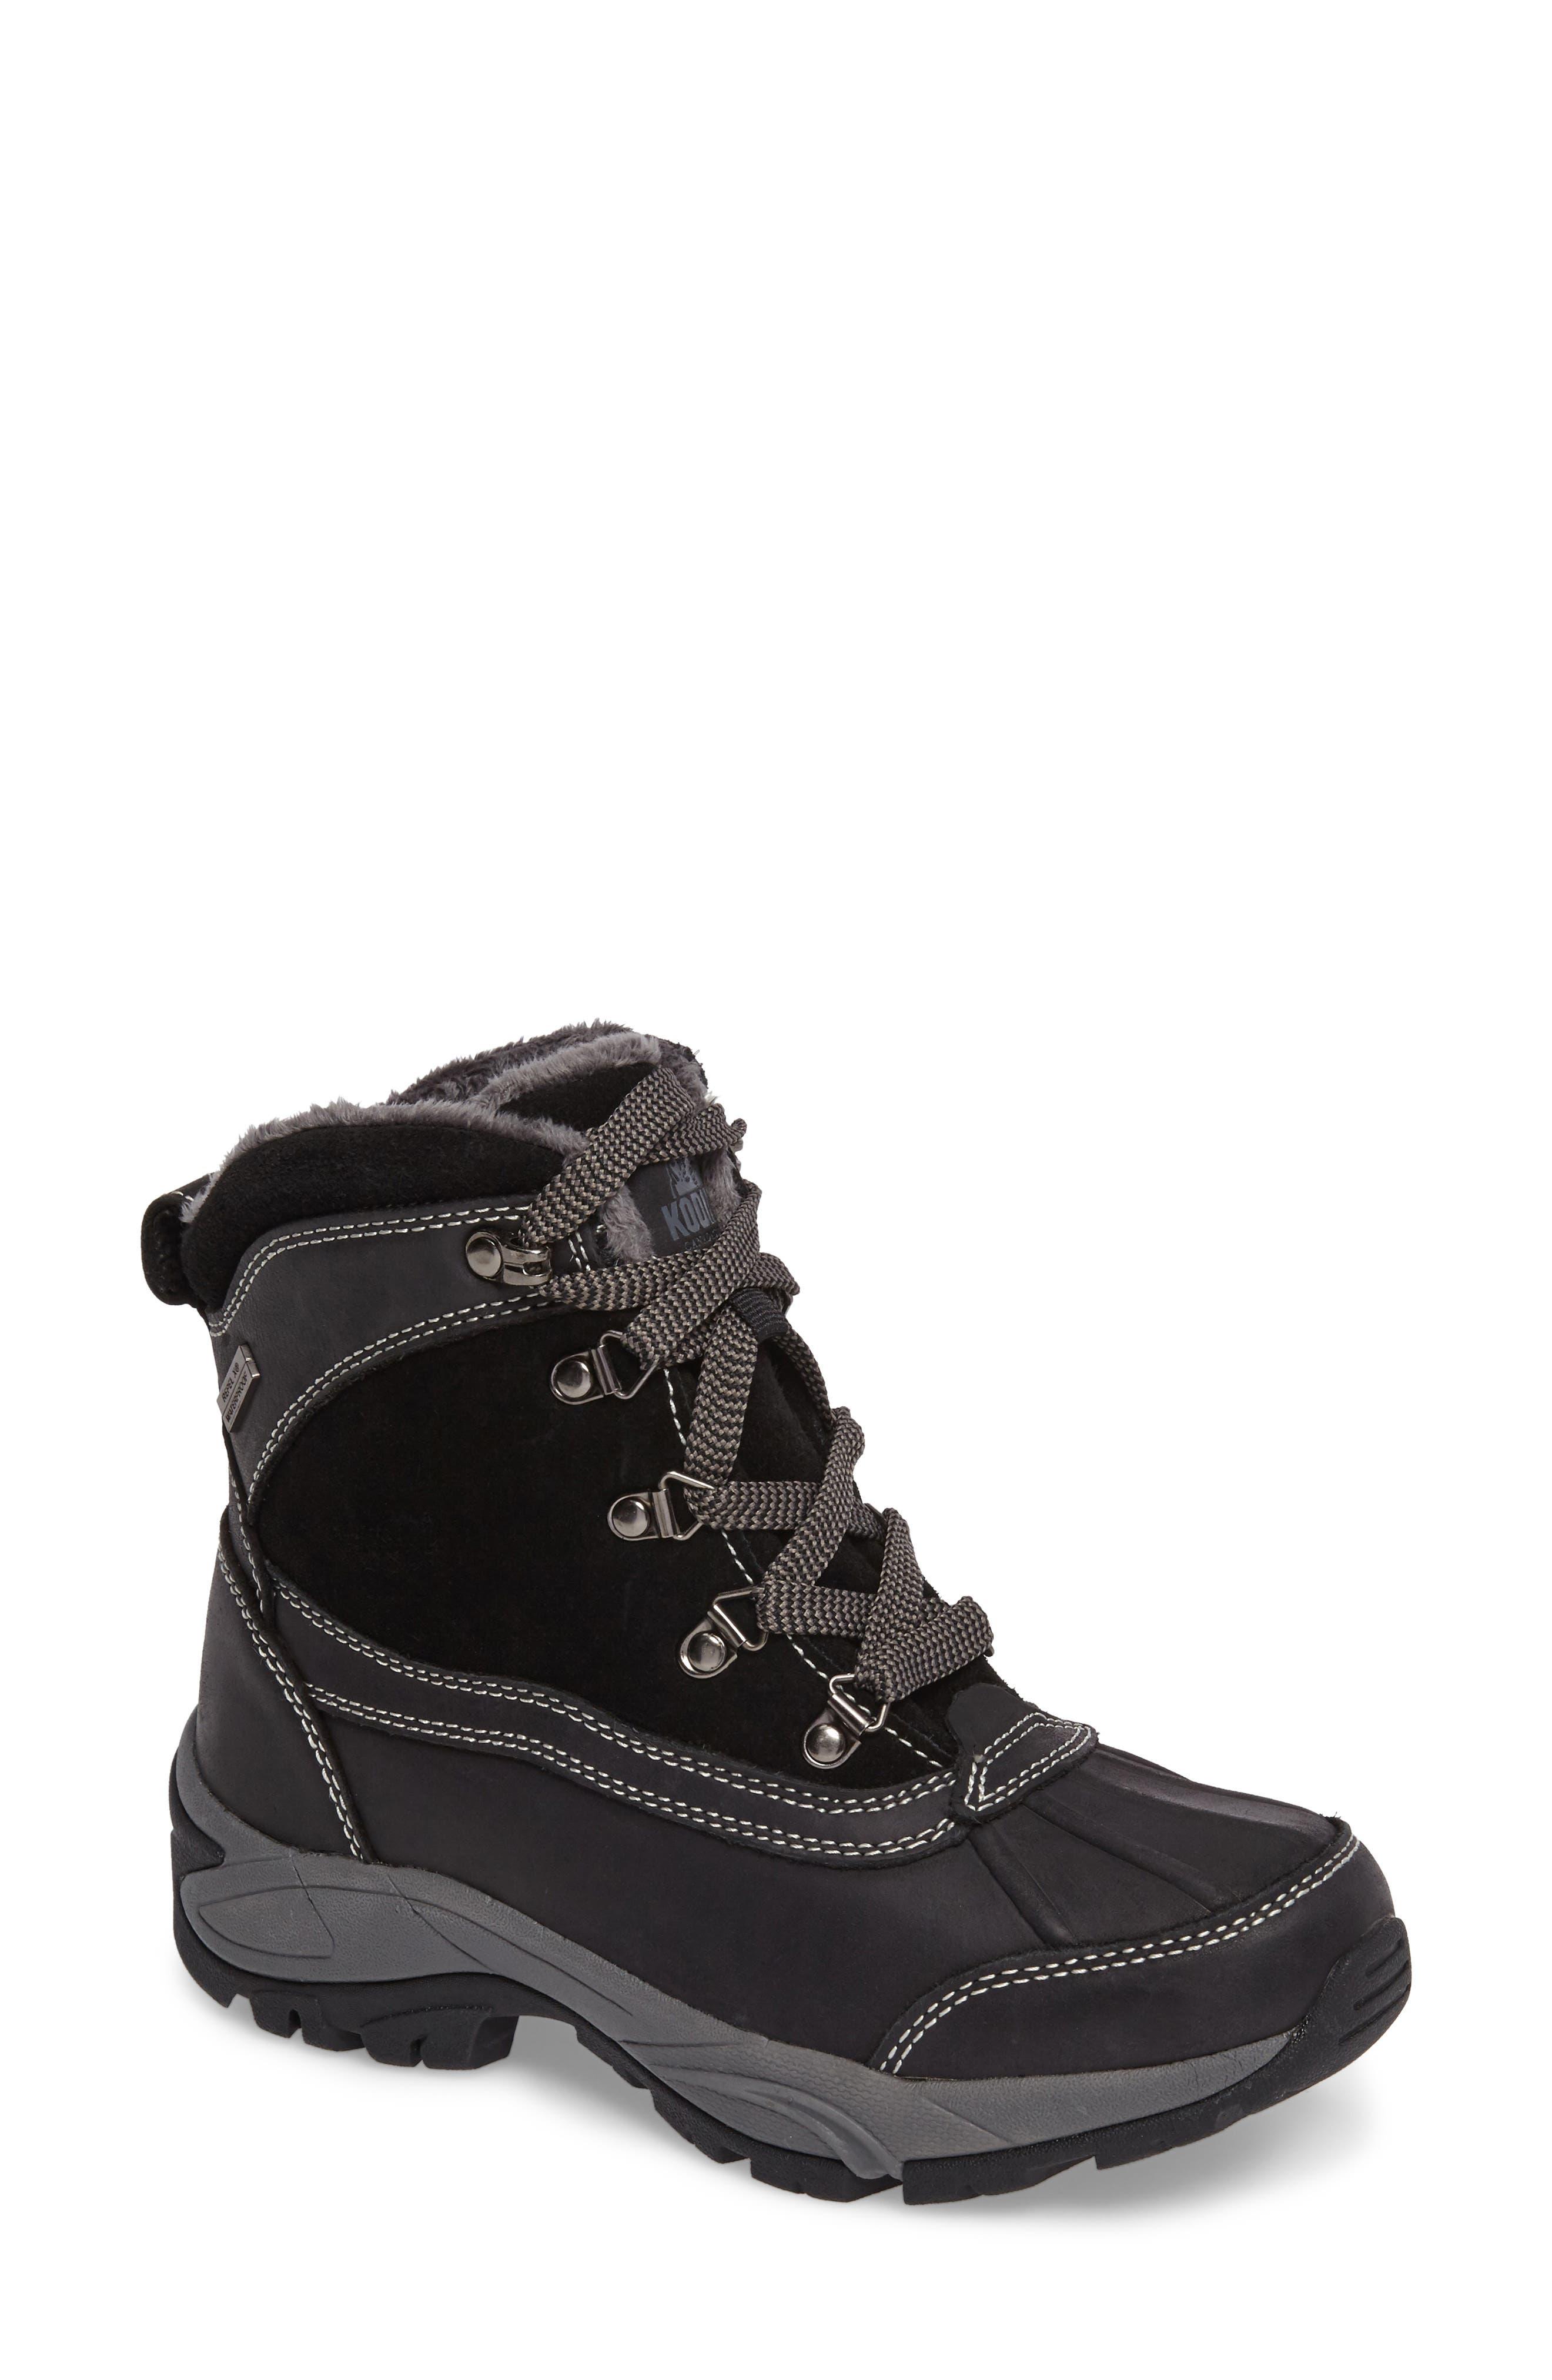 'Renee' Waterproof Insulated Winter Boot,                             Main thumbnail 1, color,                             001